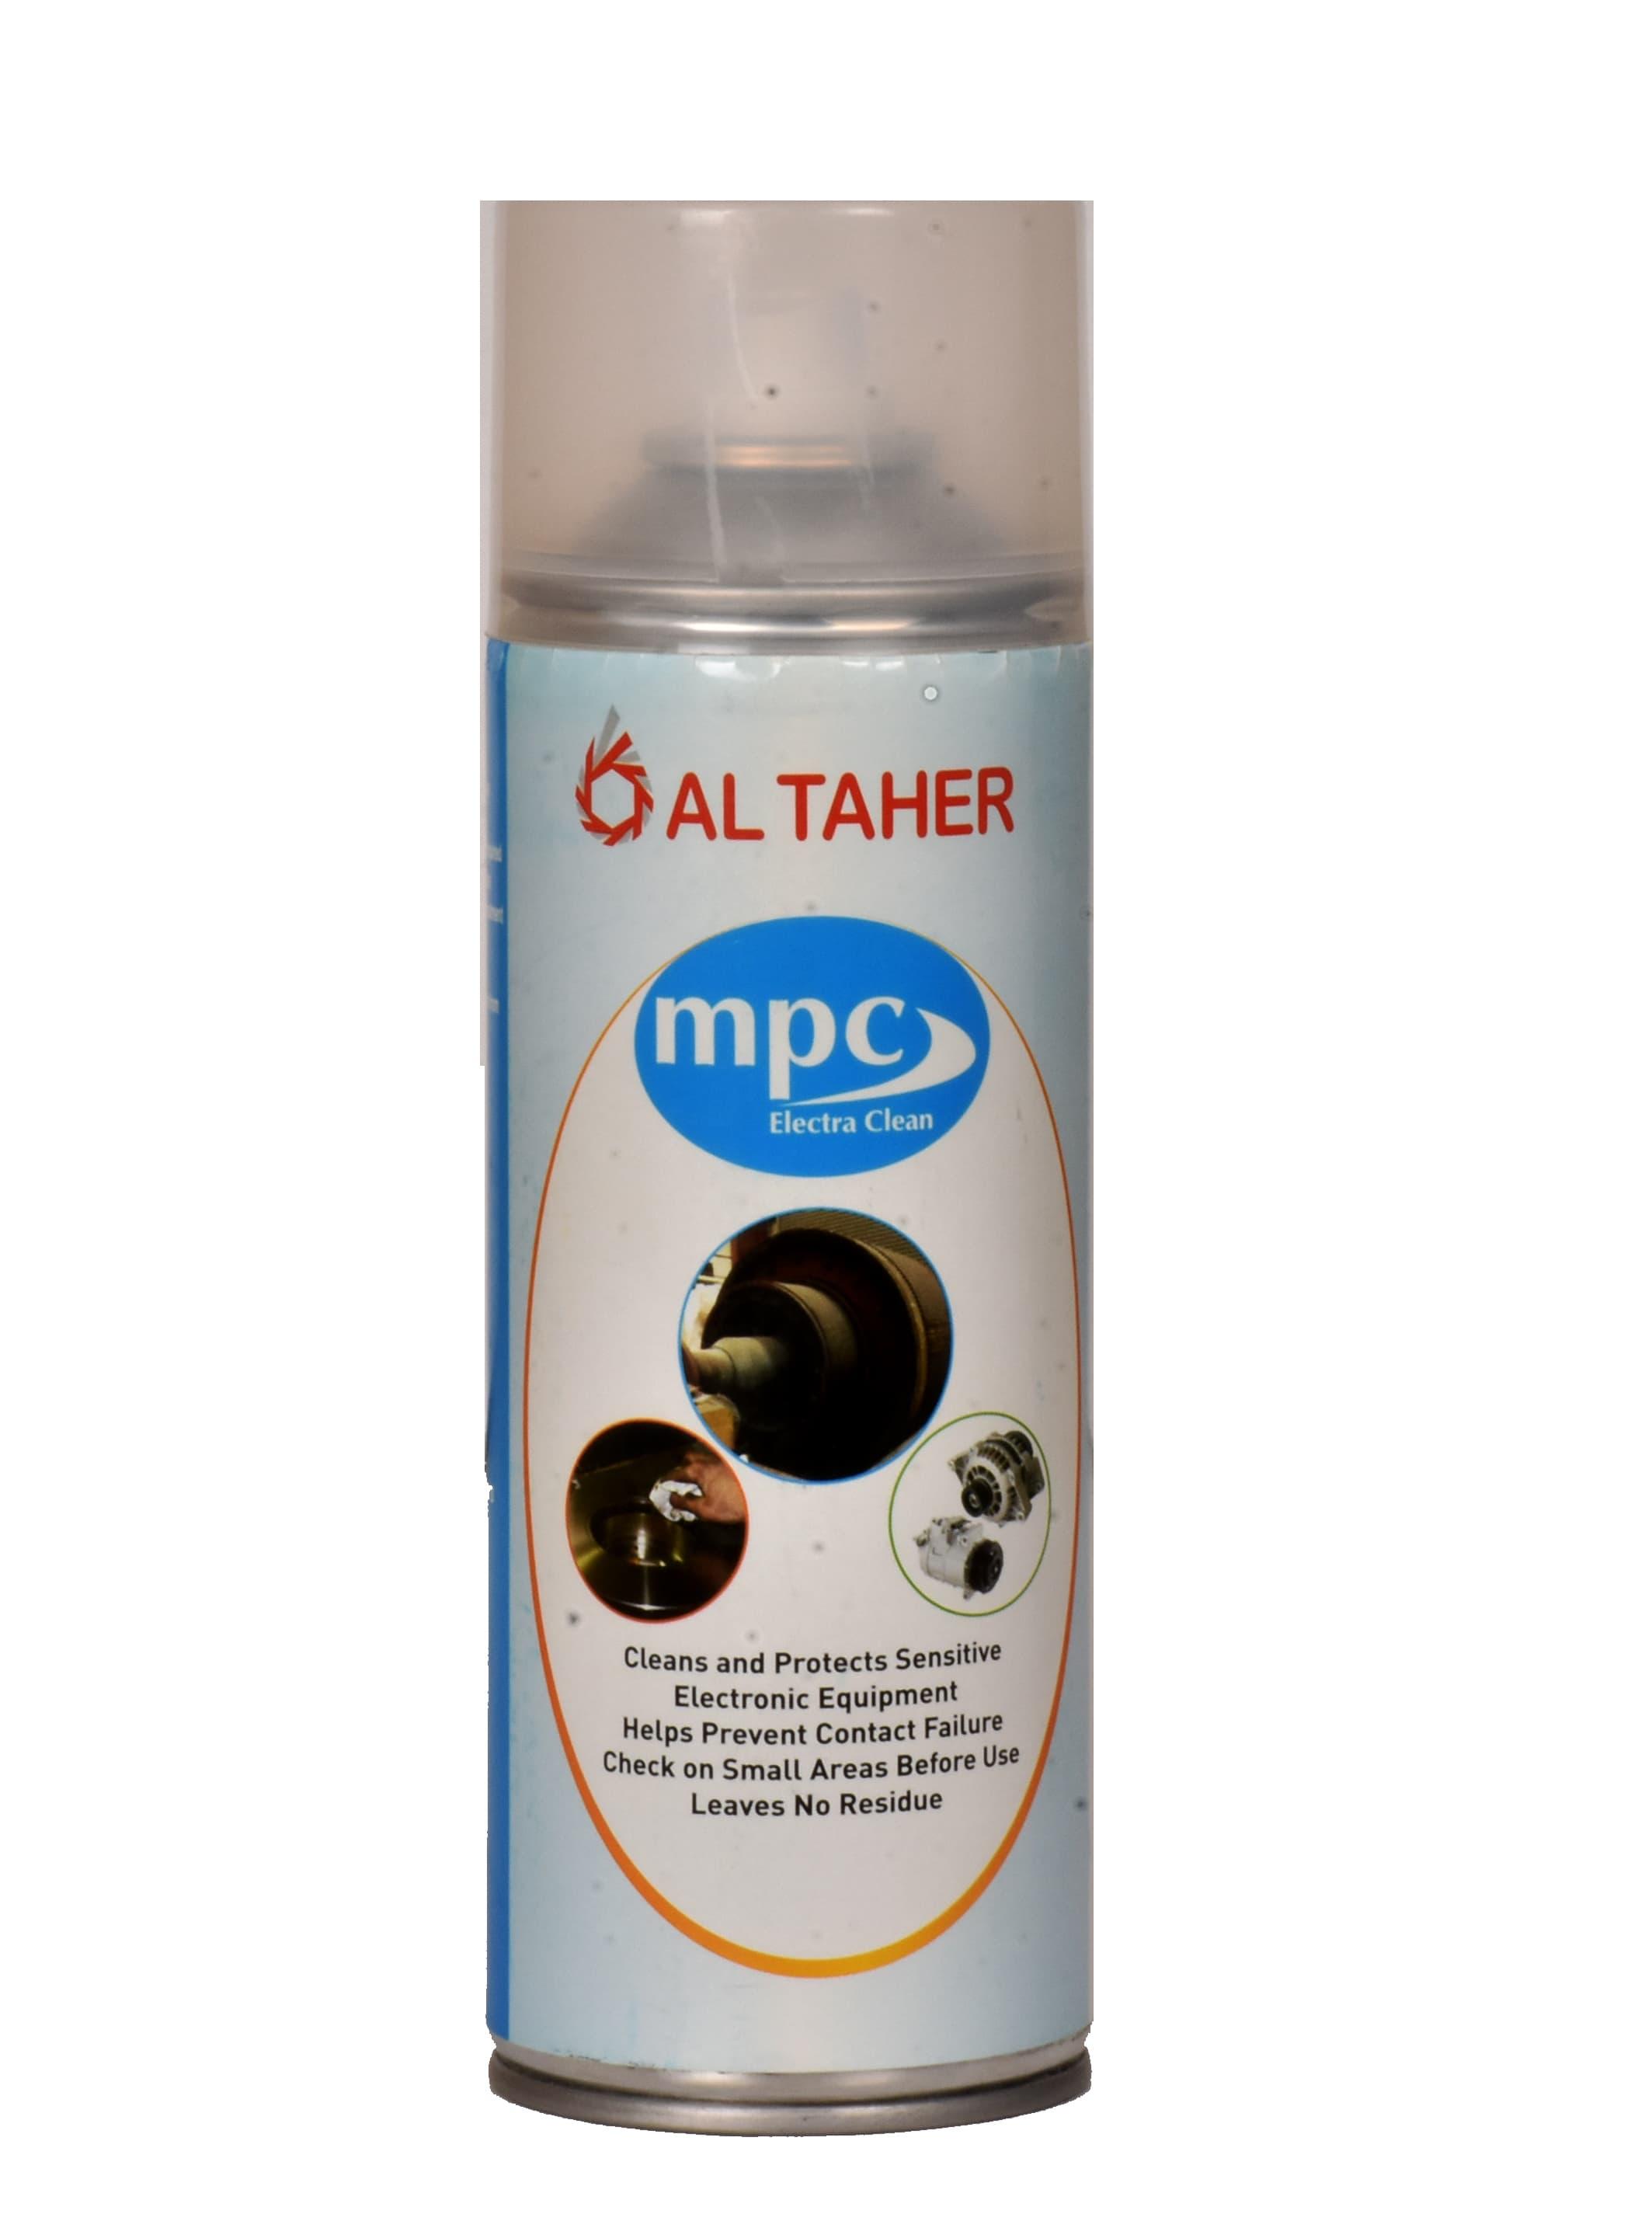 AL Taher's MPC Electraclean